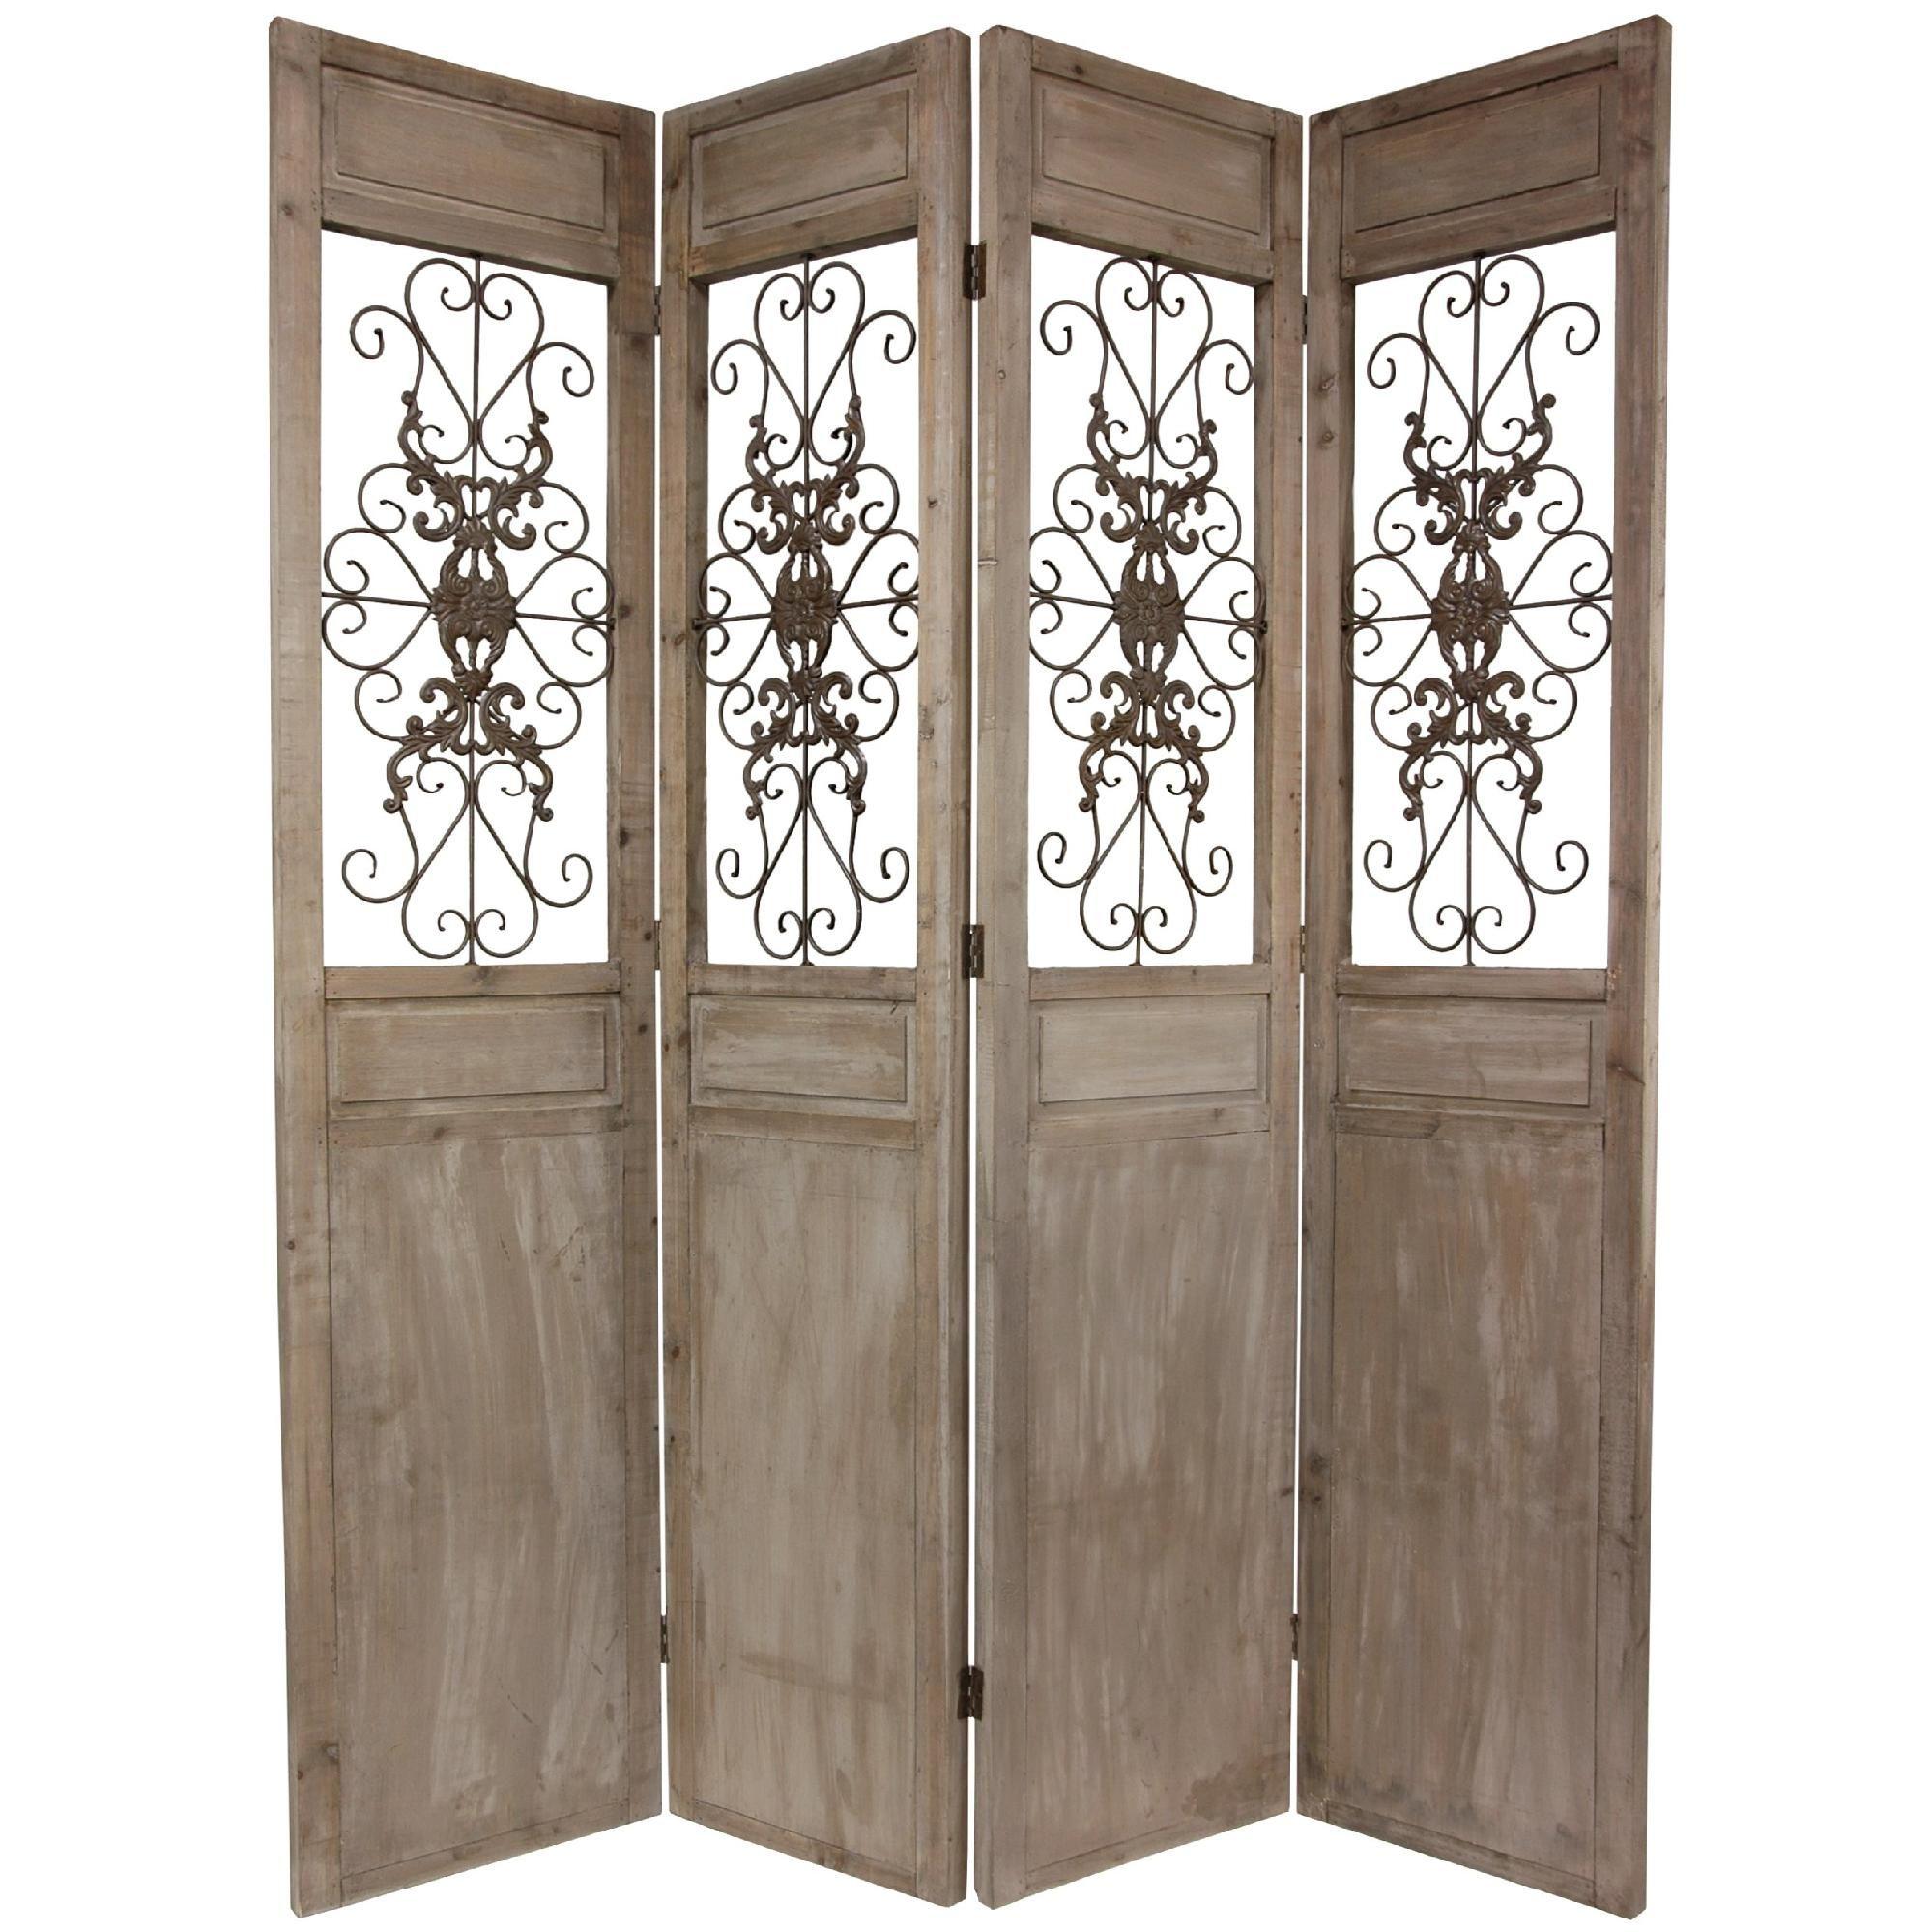 Oriental Furniture 7 Ft Tall Railing Scrolls Room Divider Gray